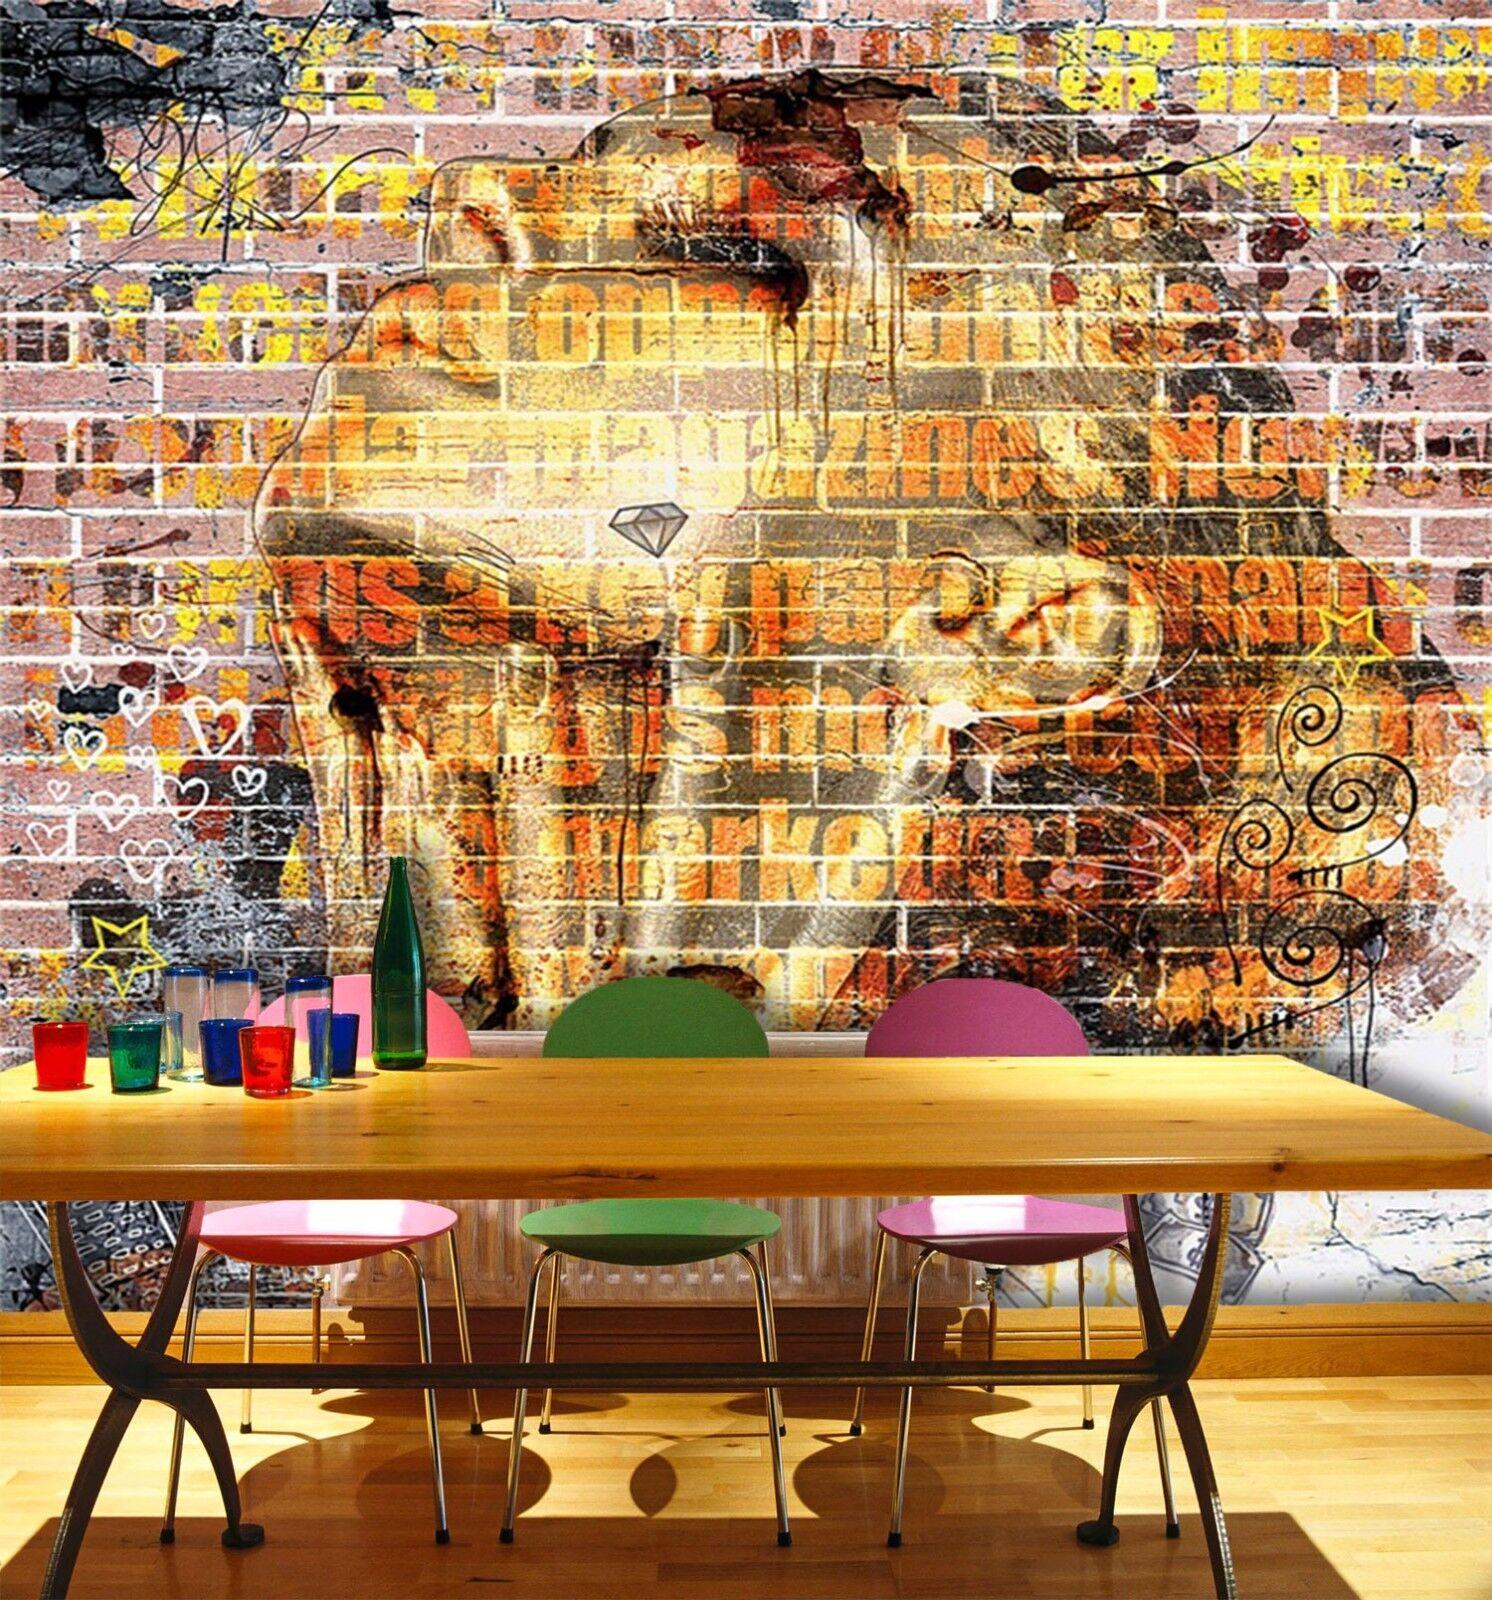 3D Ziegelmädchen 577 Tapete Tapeten Mauer Foto Familie Tapete Wandgemälde Summer